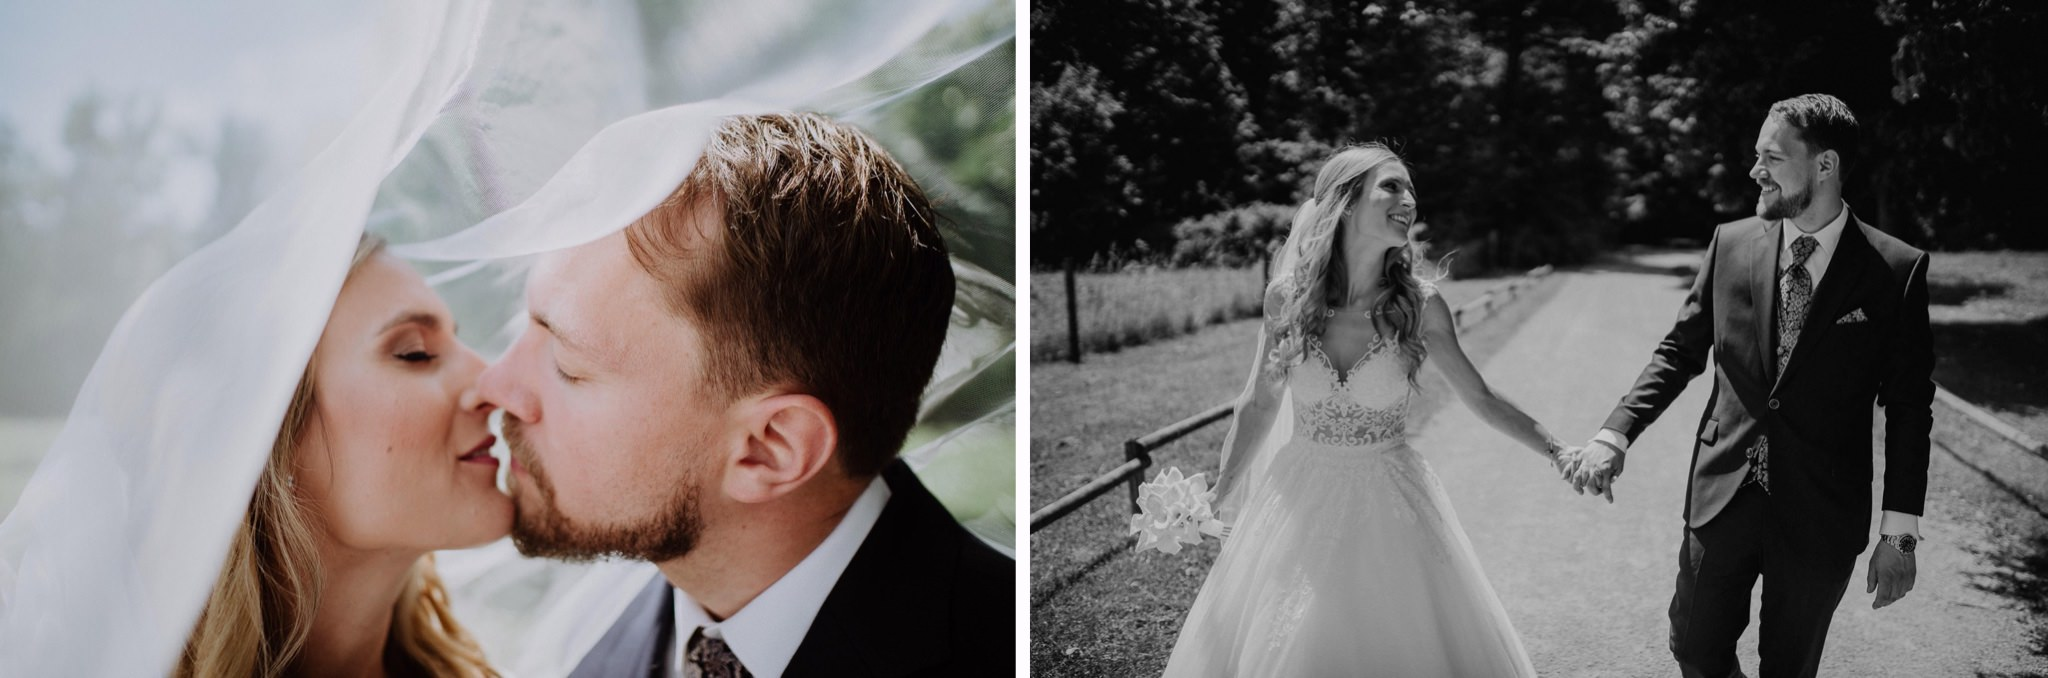 wedding photographer hamilton new zealand 1022 1